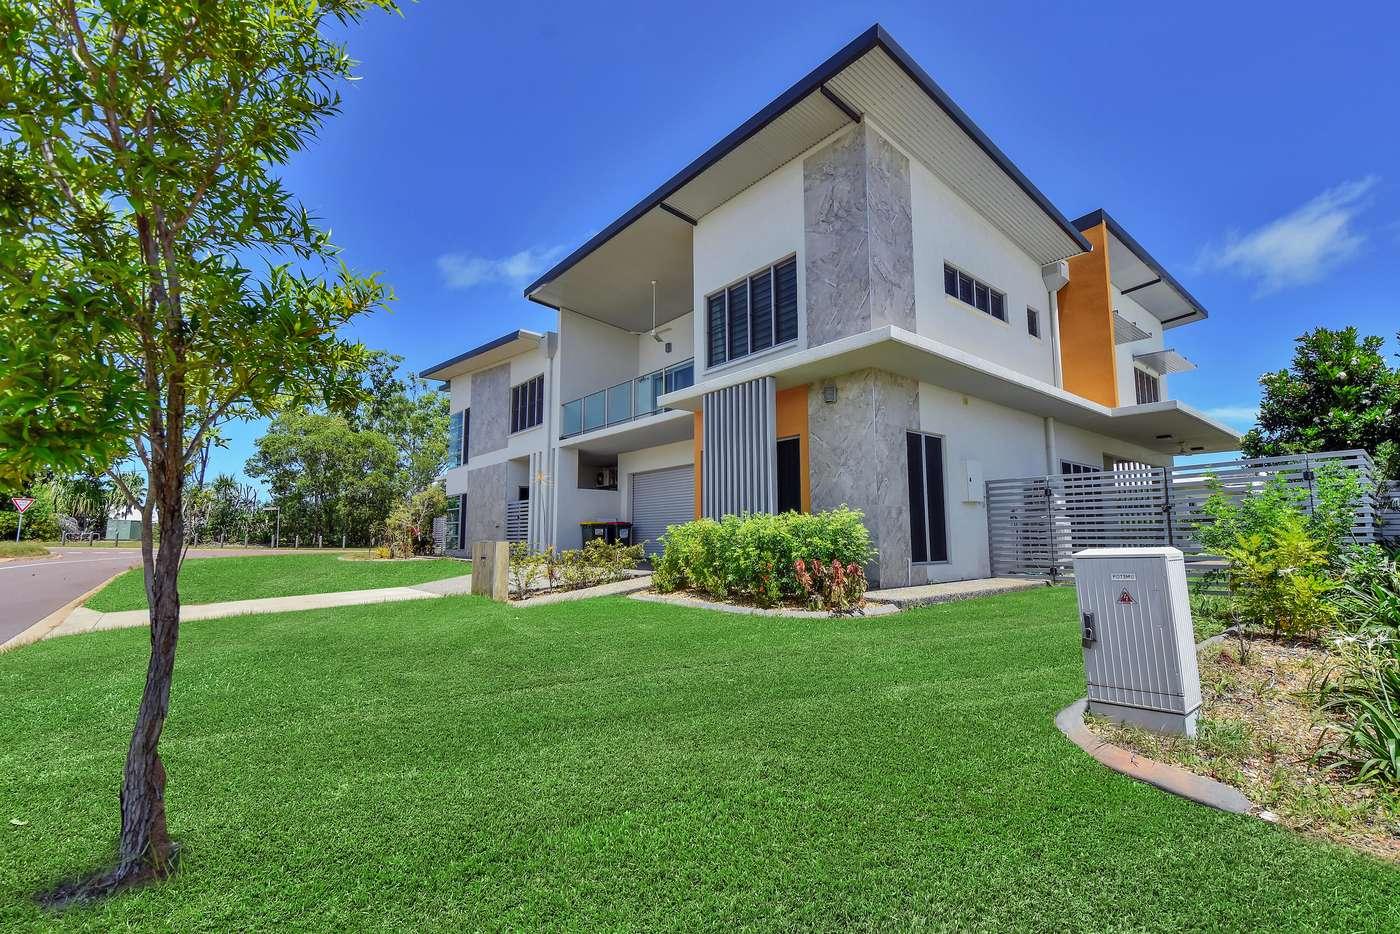 Main view of Homely house listing, 2/1 Barratt Street, Muirhead NT 810